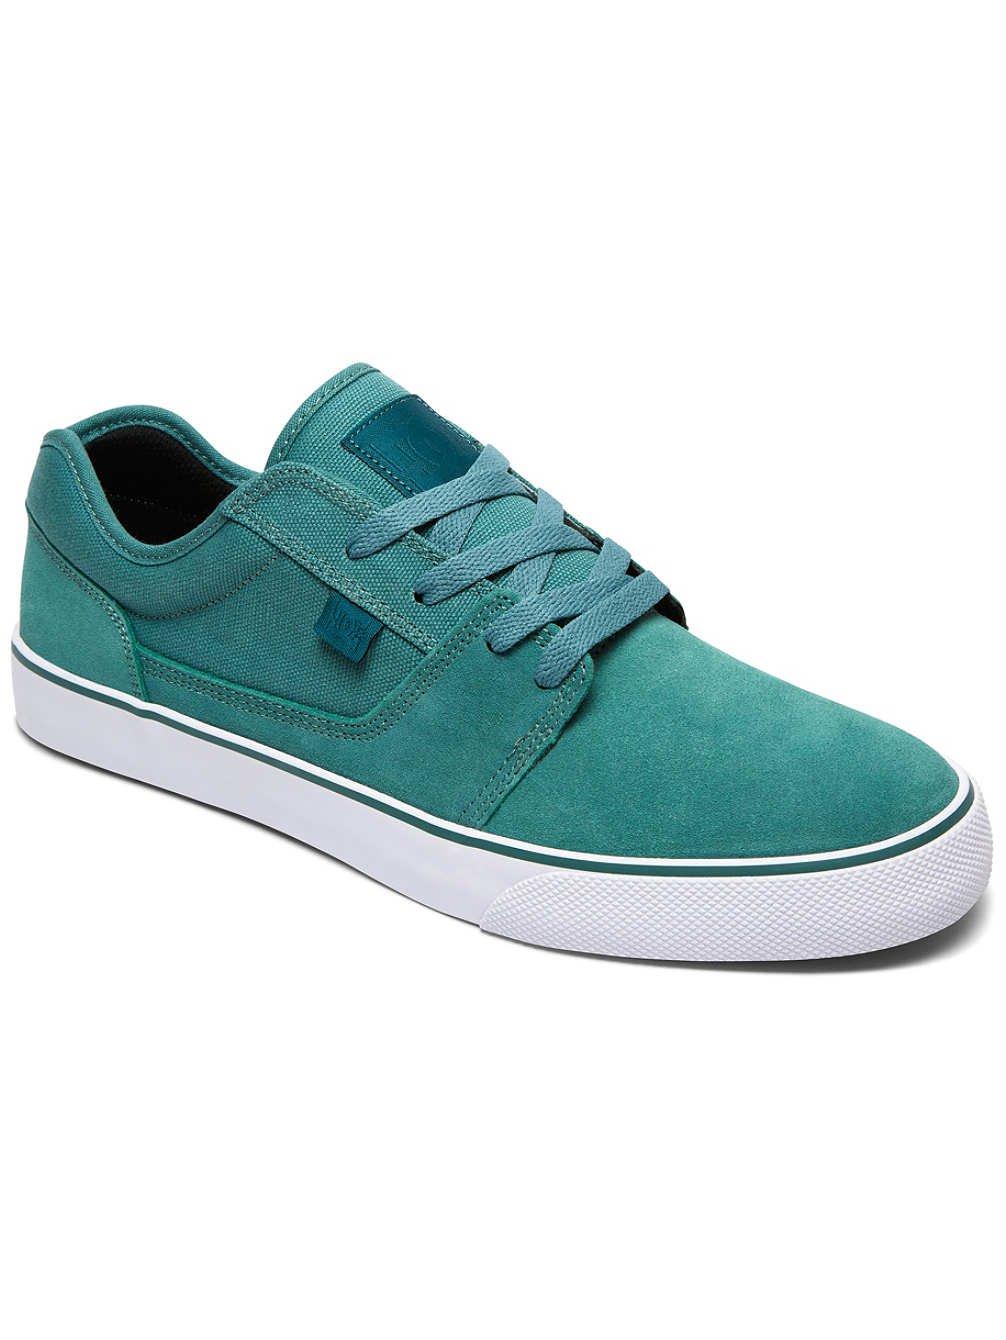 DC TONIK Unisex-Erwachsene Sneakers  45 EU|Sage